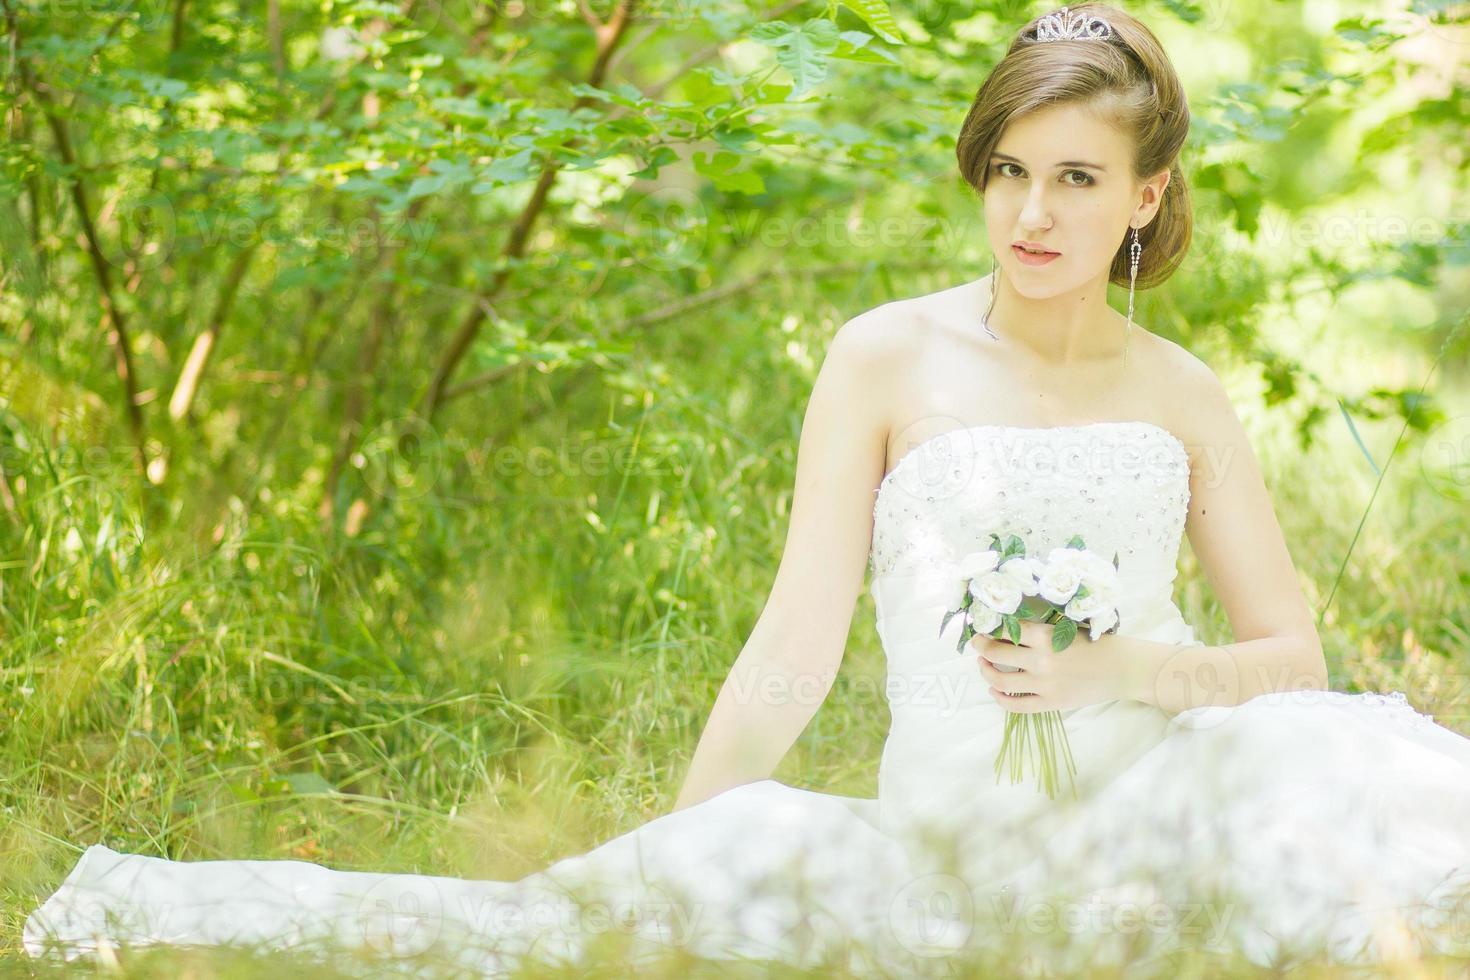 retrato de una bella joven novia en la naturaleza foto